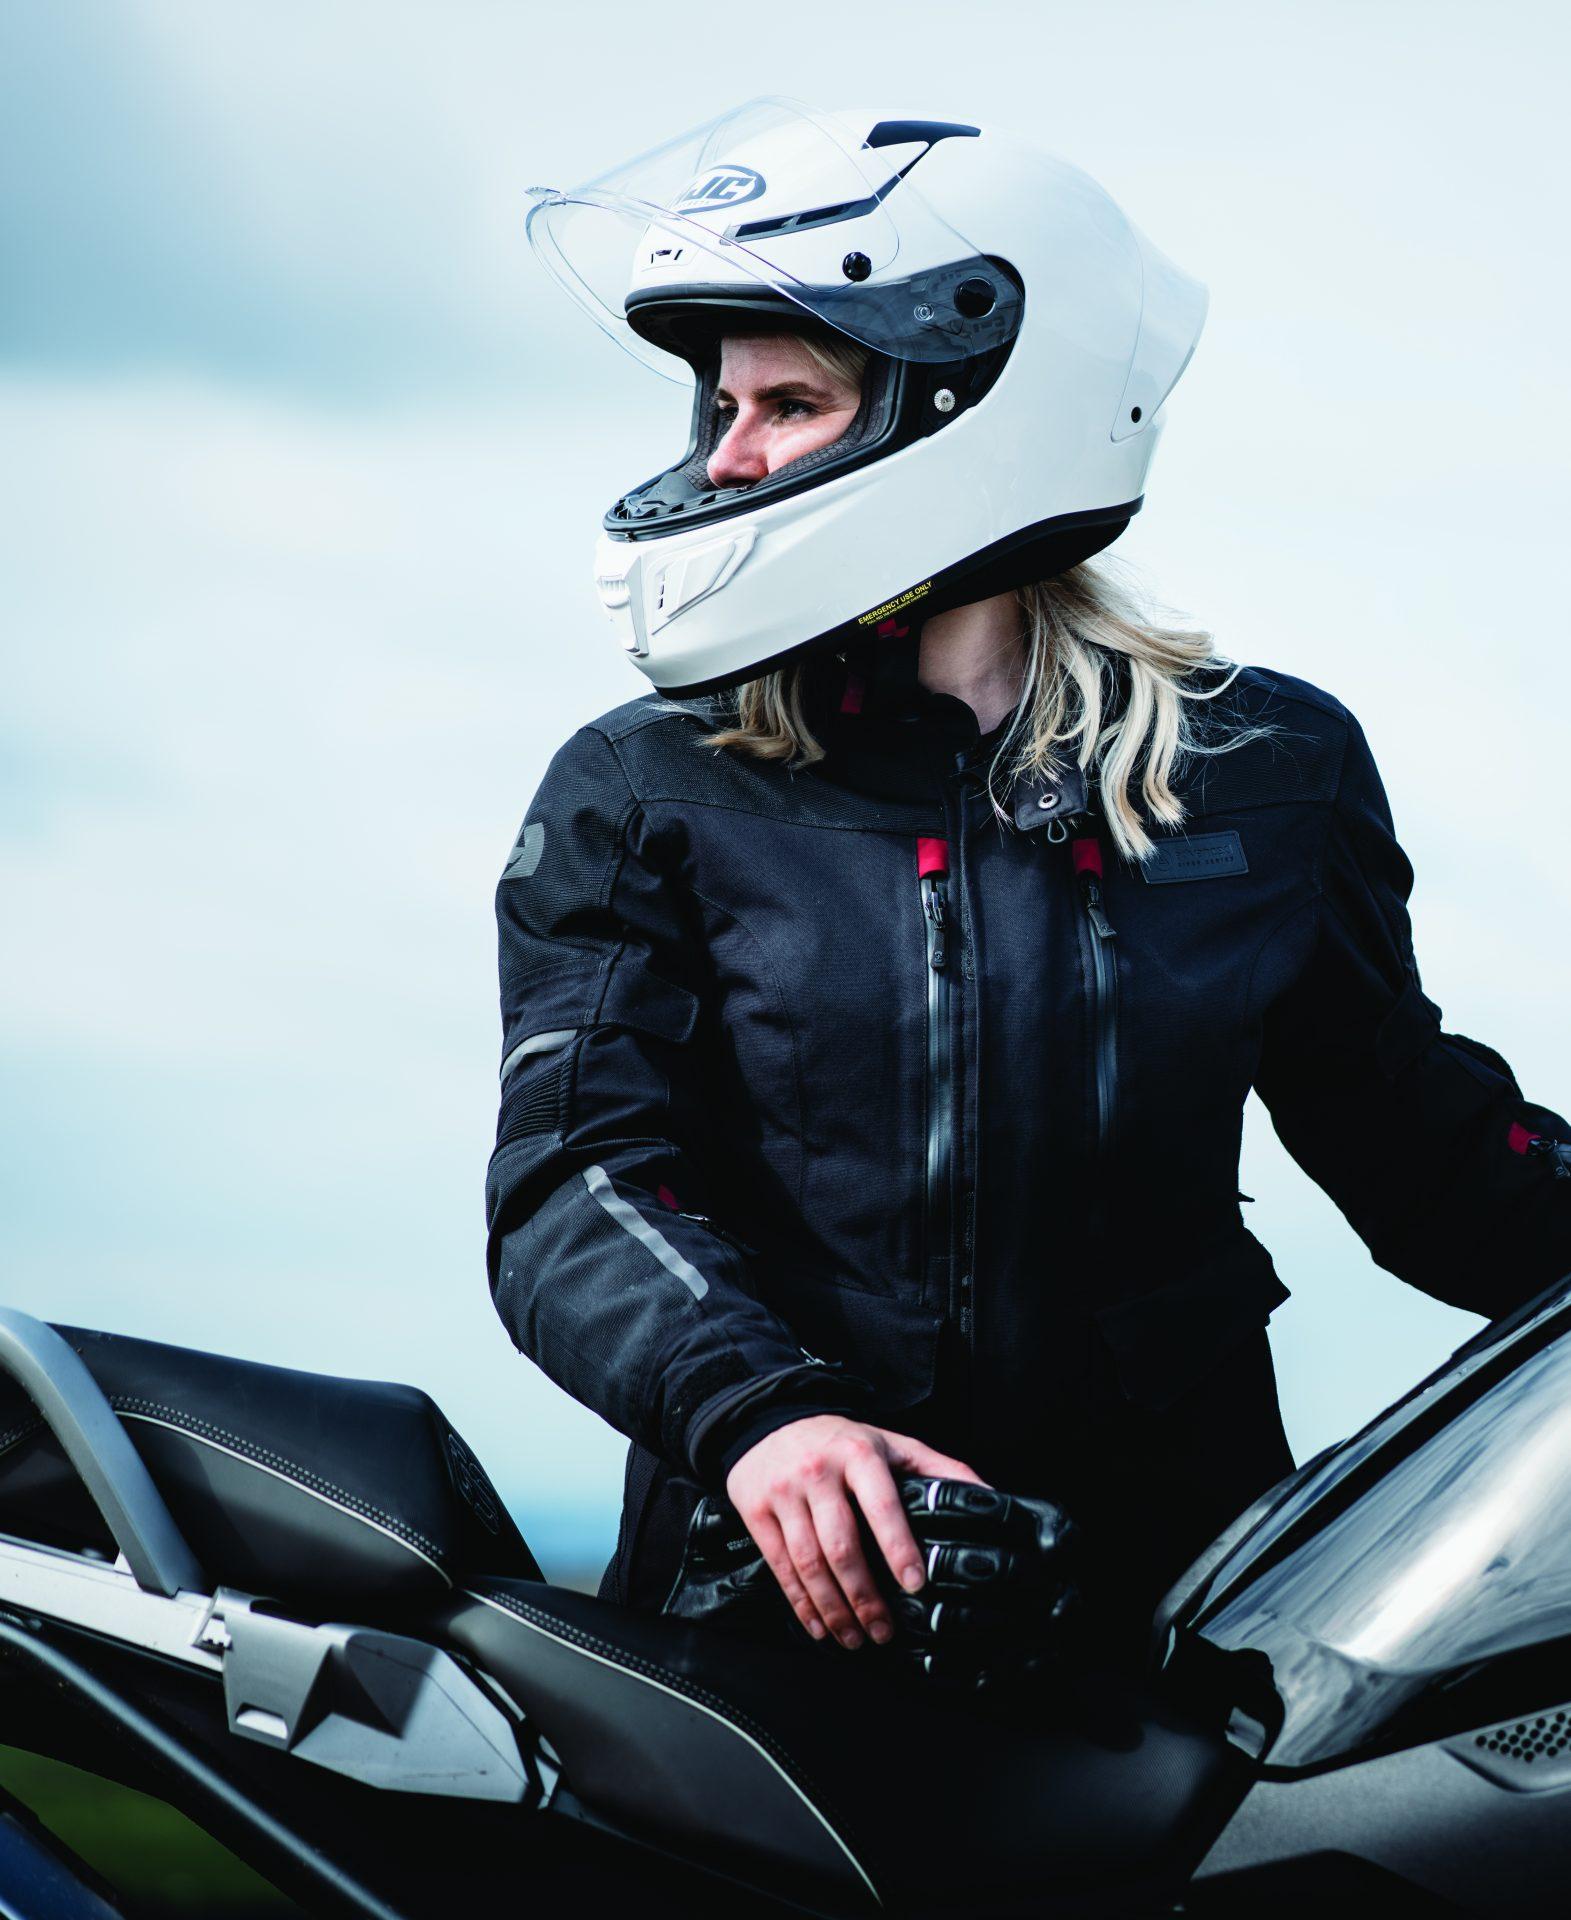 Mondial-kate-cover-shot-copy-scaled Women's Mondial Laminate Jacket